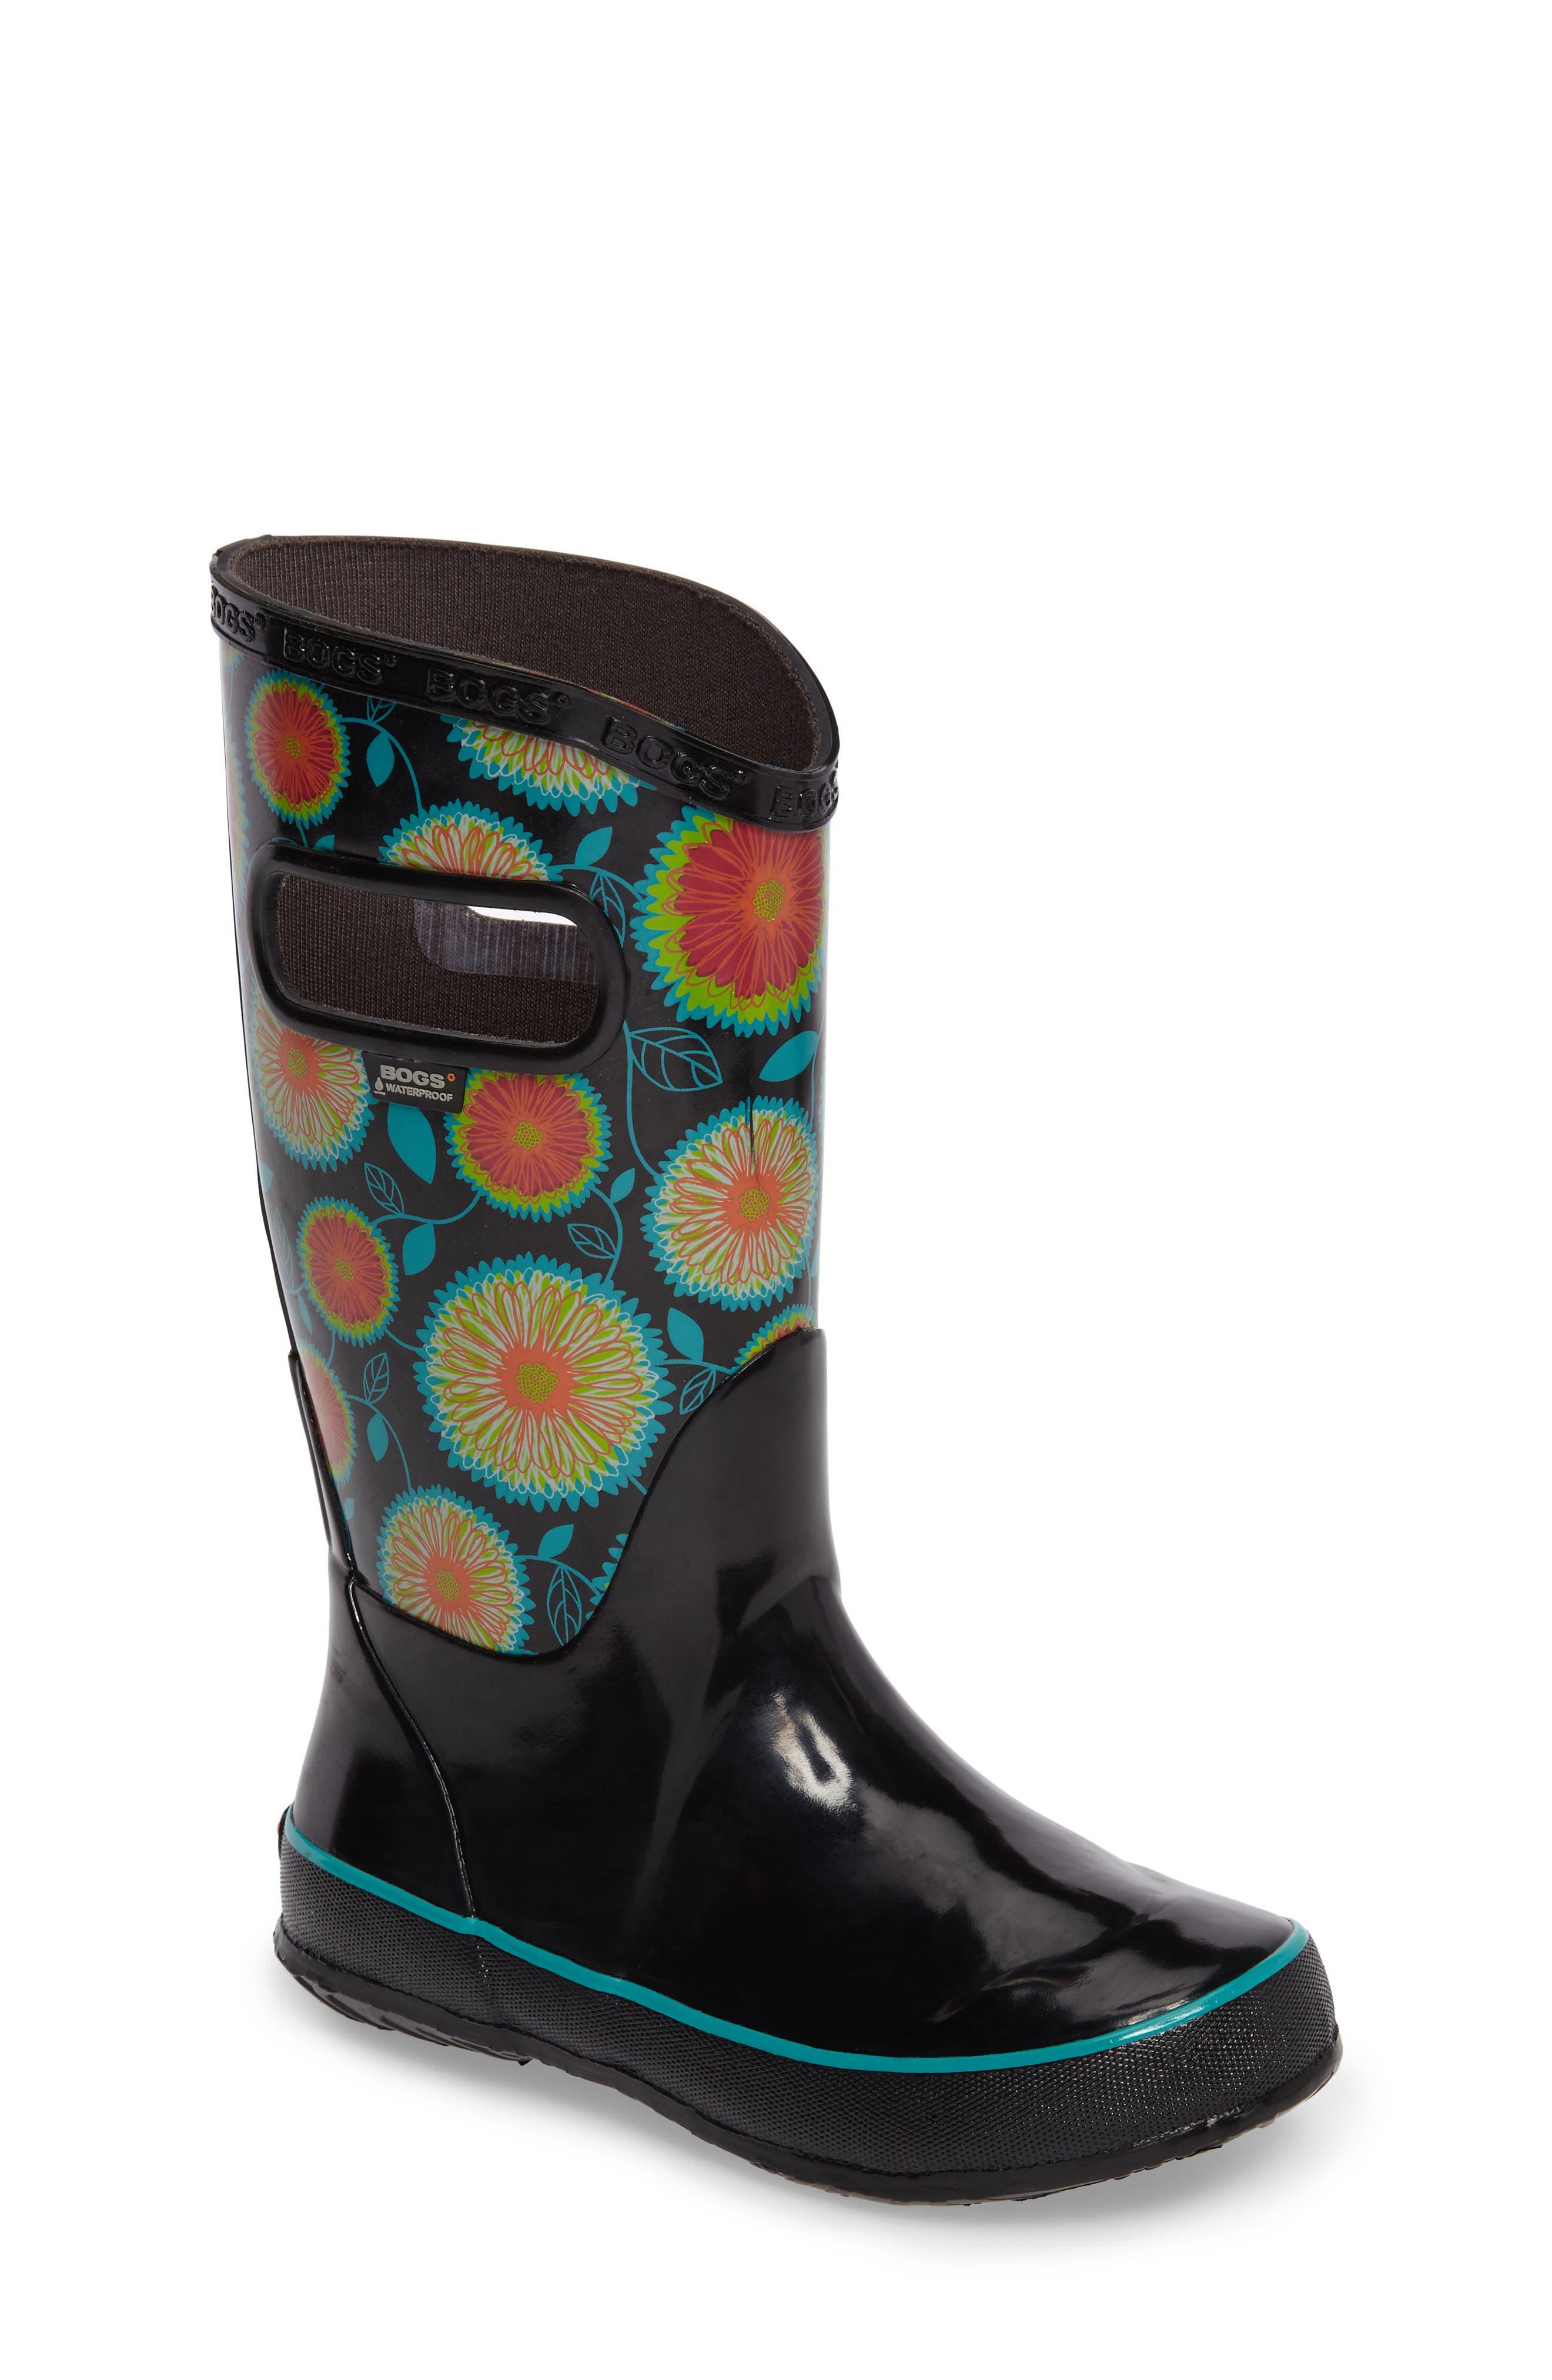 Wildflowers Waterproof Rubber Rain Boot,                         Main,                         color, Black Multi